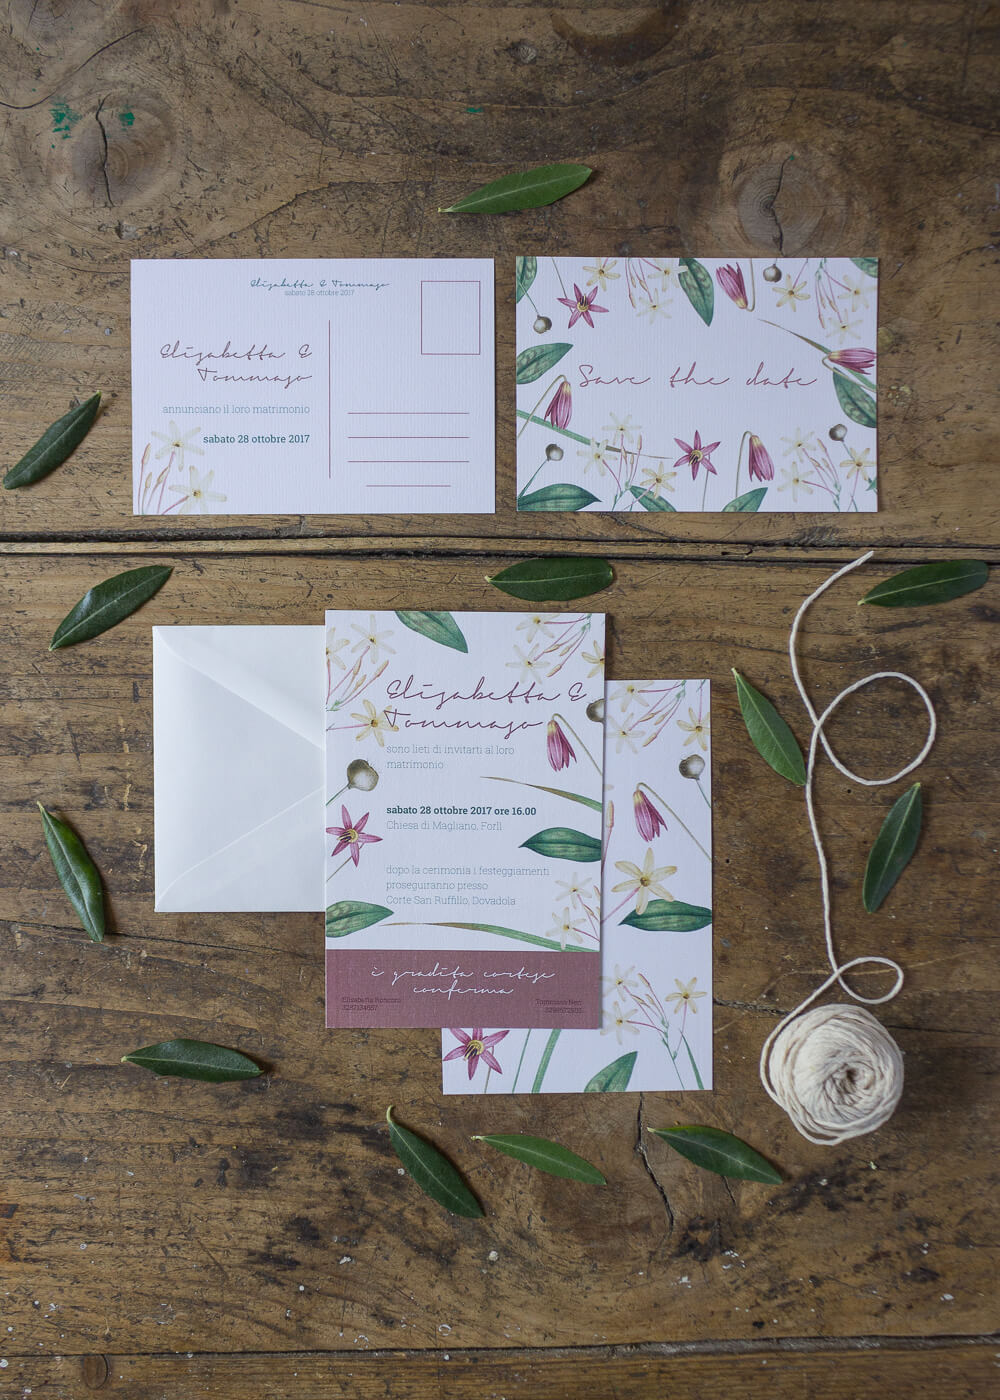 Wedding suite botanica Lillie - Partecipazioni di matrimonio e cartolina Save the date in carta vergata - Dettagli botanici - Lily&Sage Design